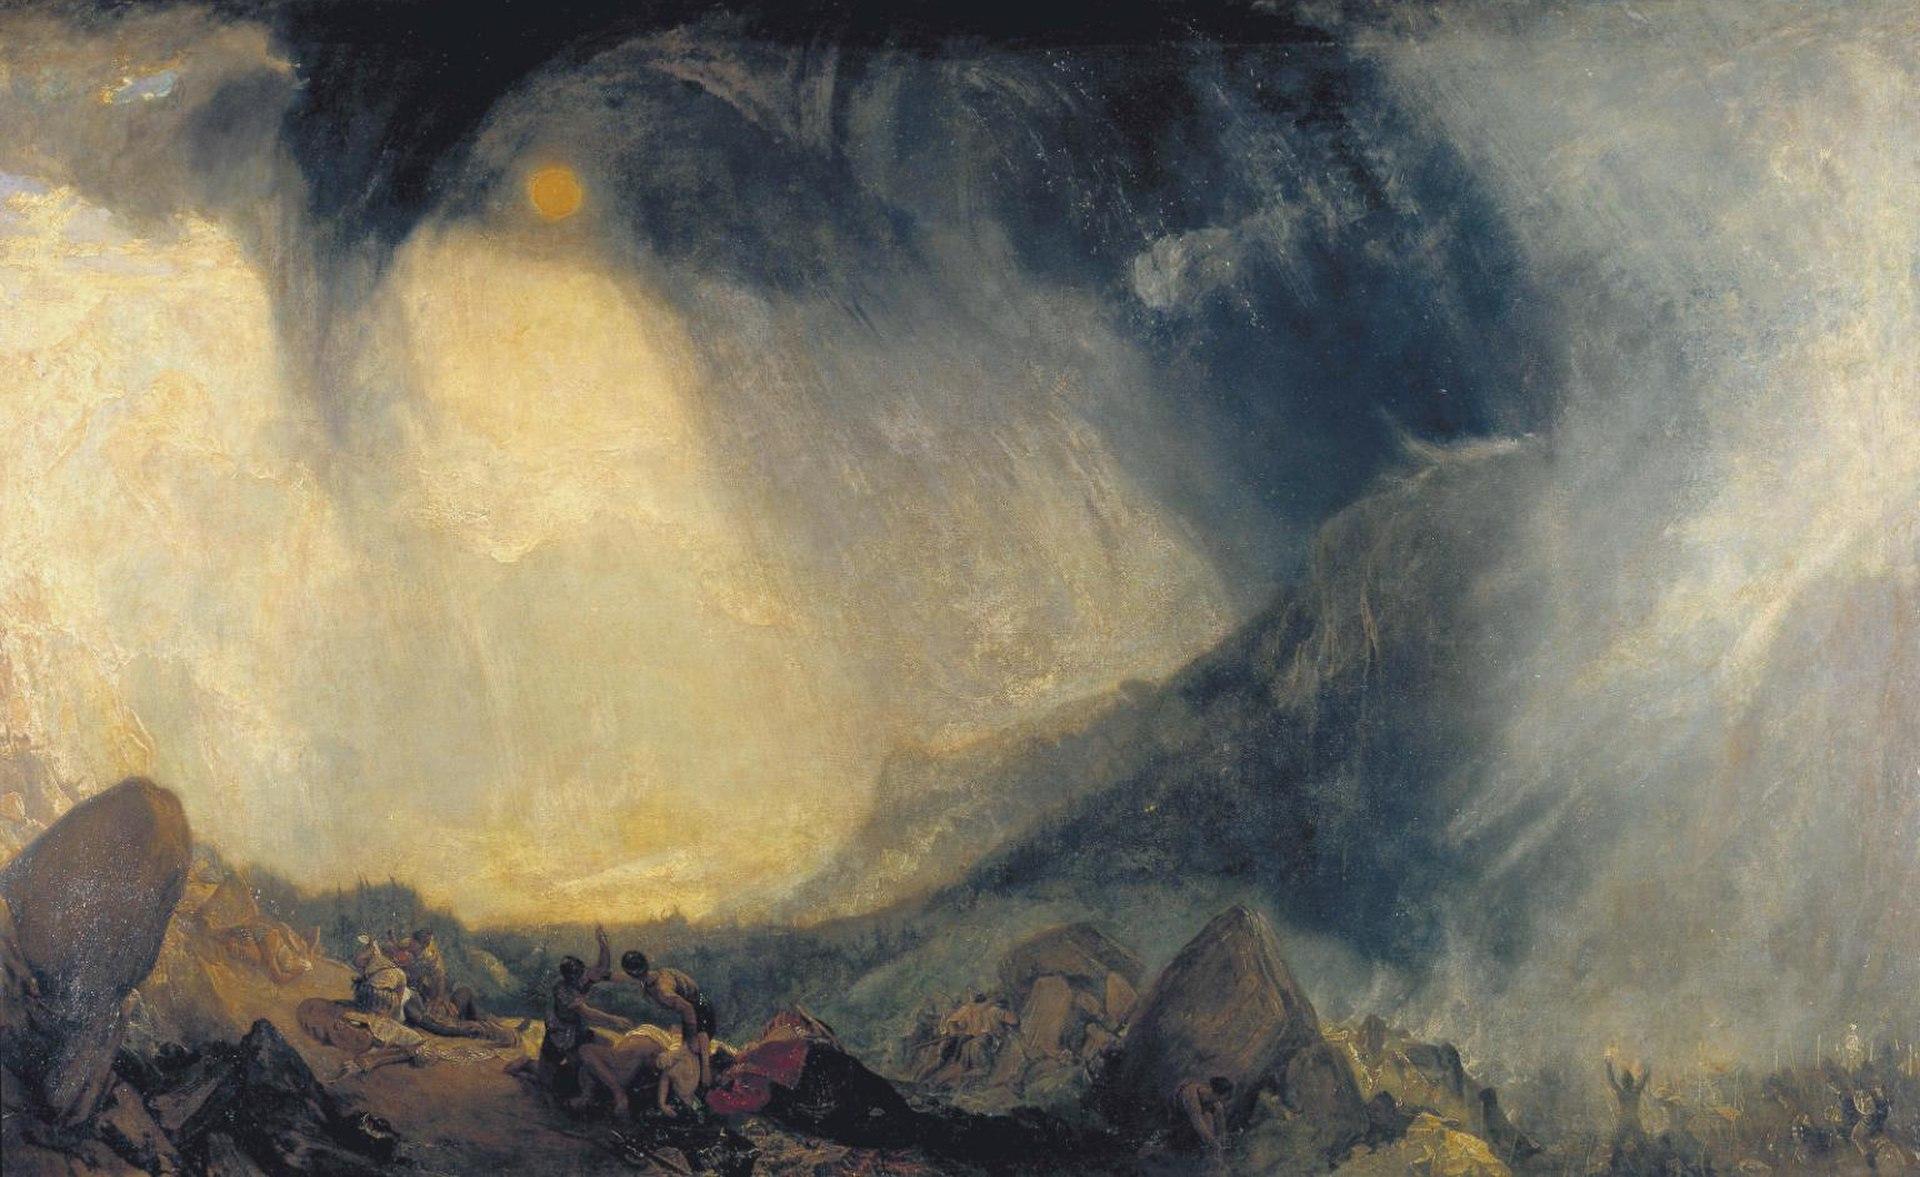 J.M.W. Turner, Hannibal traversant les Alpes, 1812